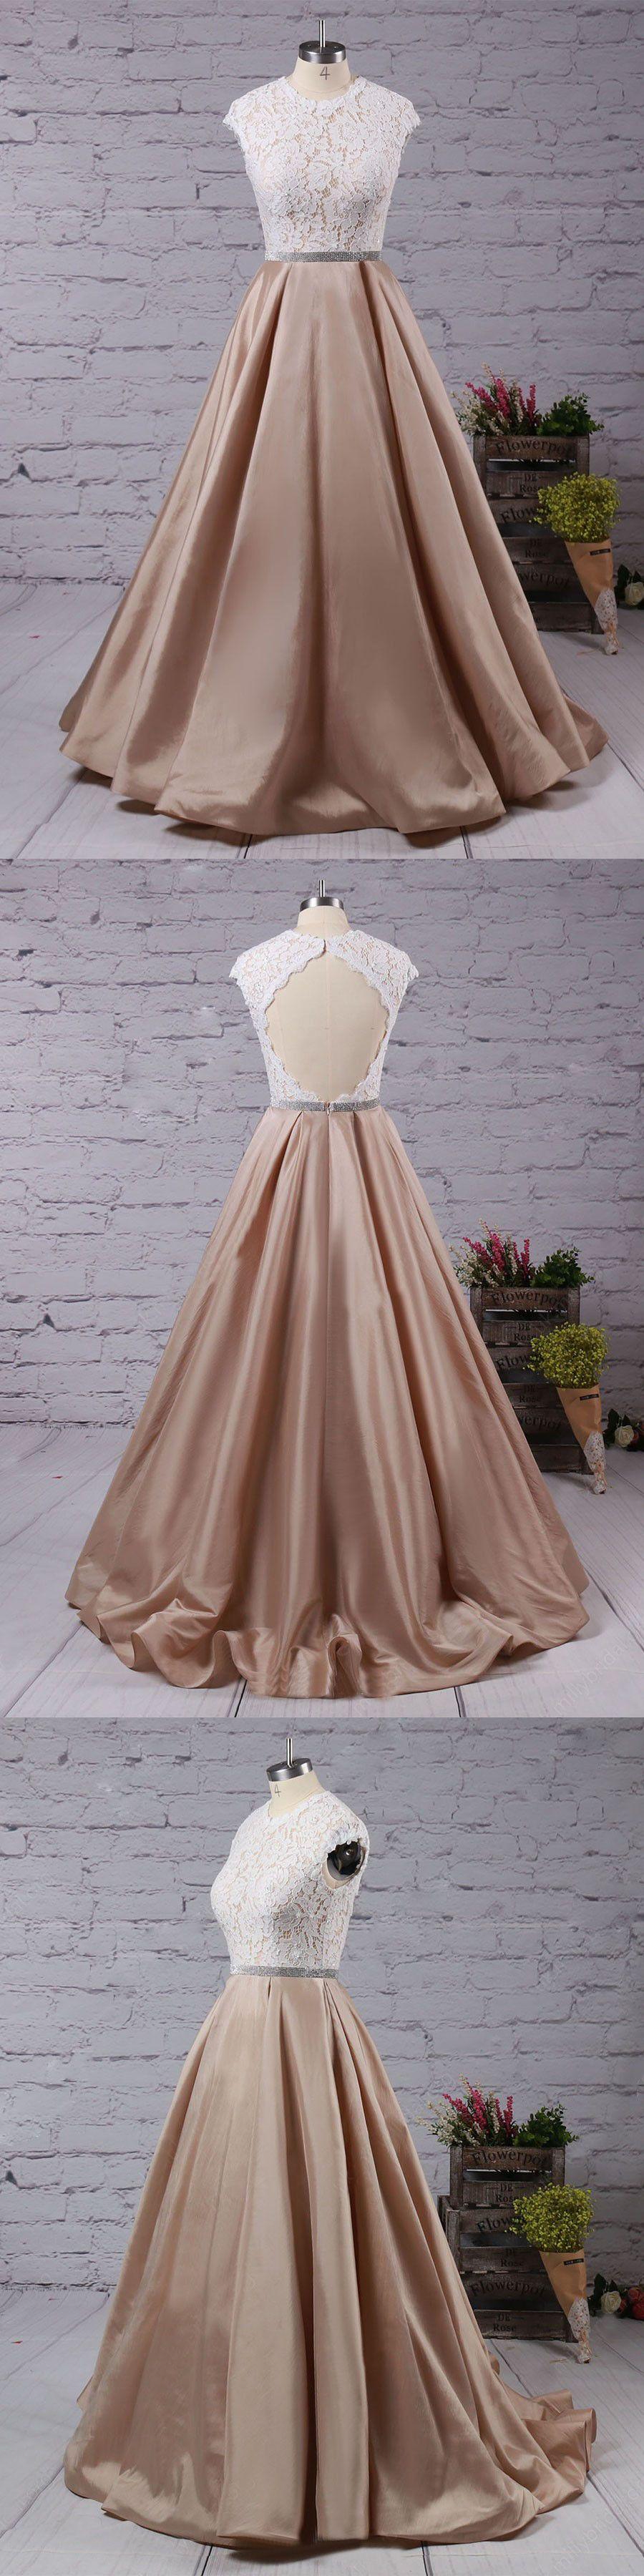 Chic lace prom dress modest a line cheap long prom dress vb